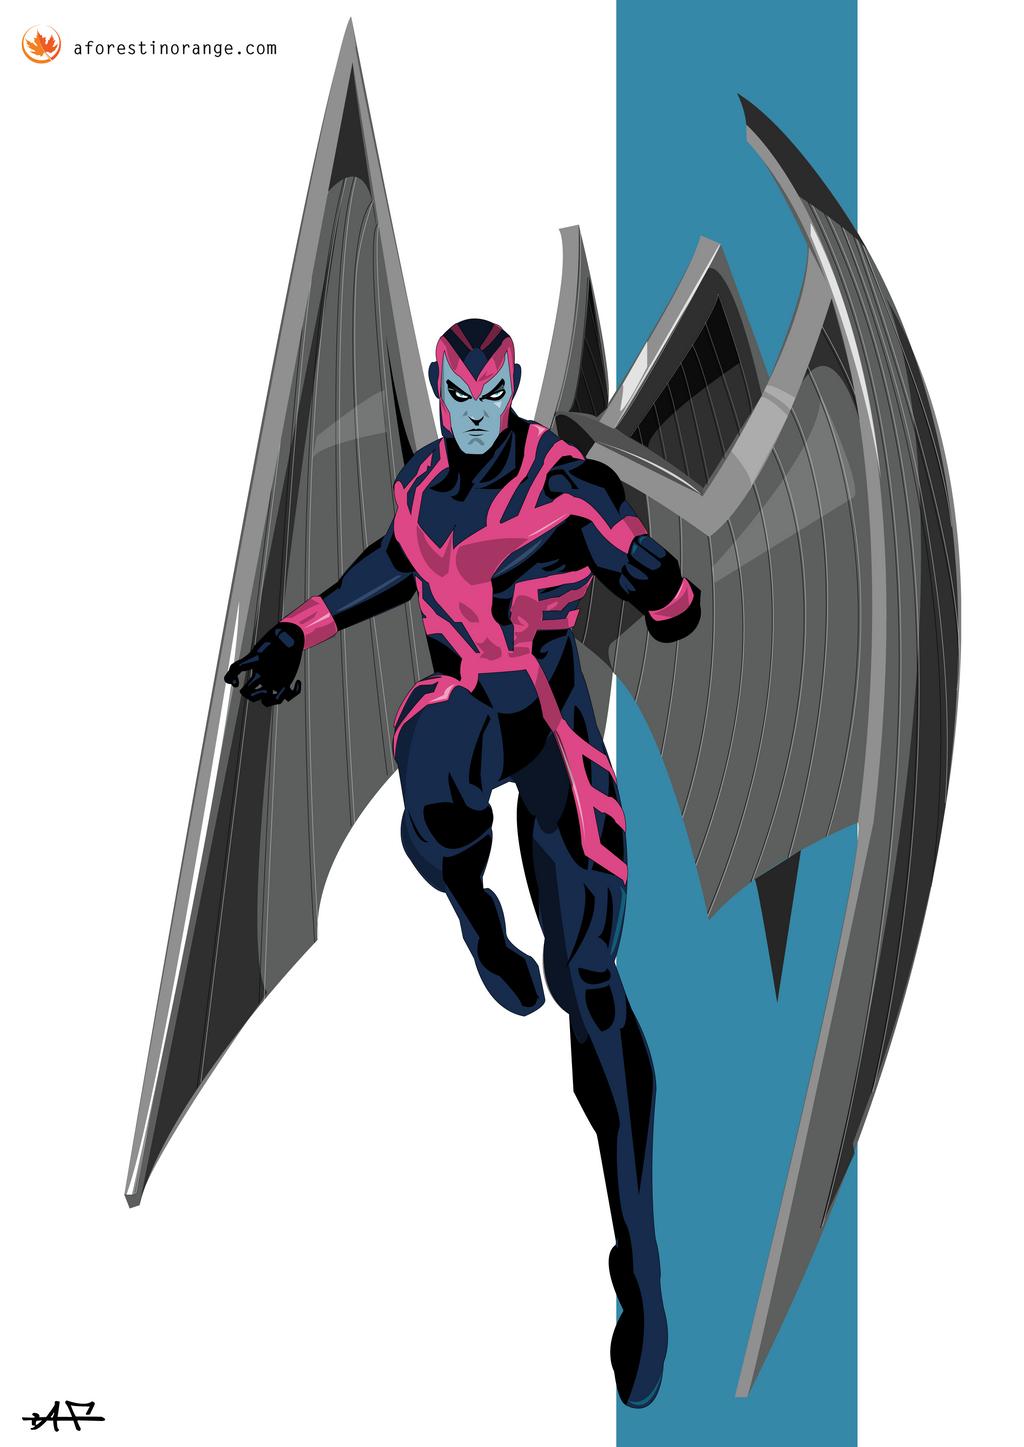 Archangel (X-Men) by FeydRautha81 on DeviantArt